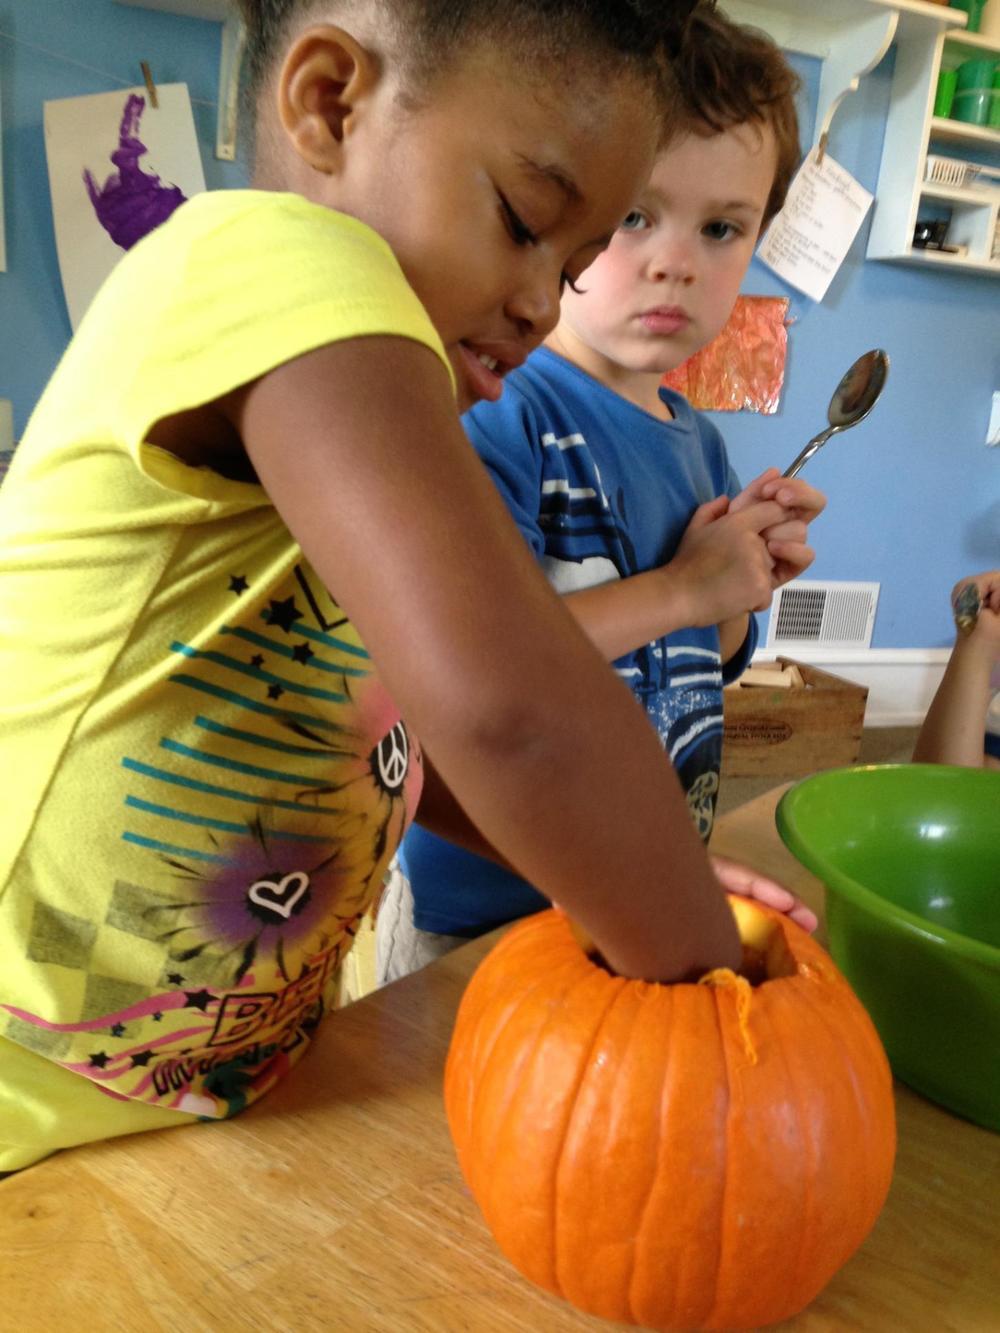 Looking for Seeds Inside a Pumpkin